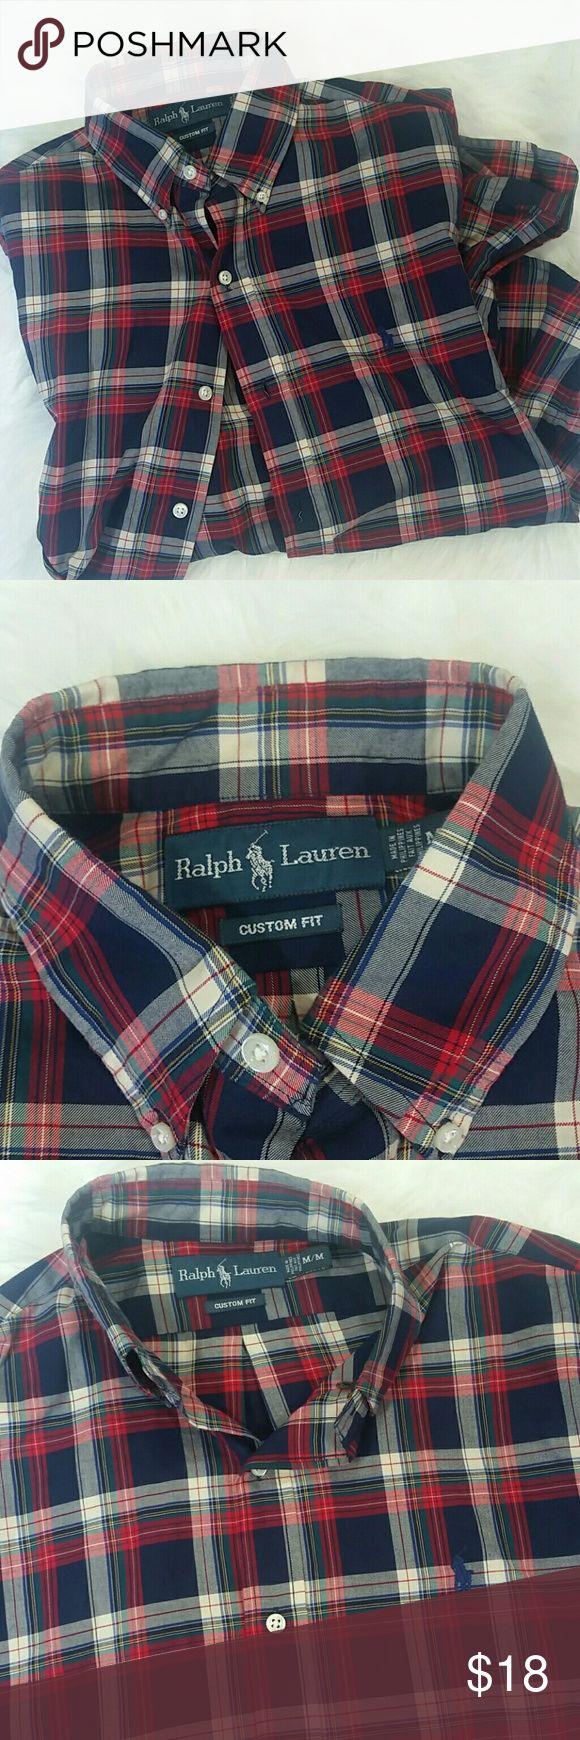 "Polo Ralph Lauren Custom Fit Long Sleeve Never worn. Length - 25"" Polo by Ralph Lauren Shirts"